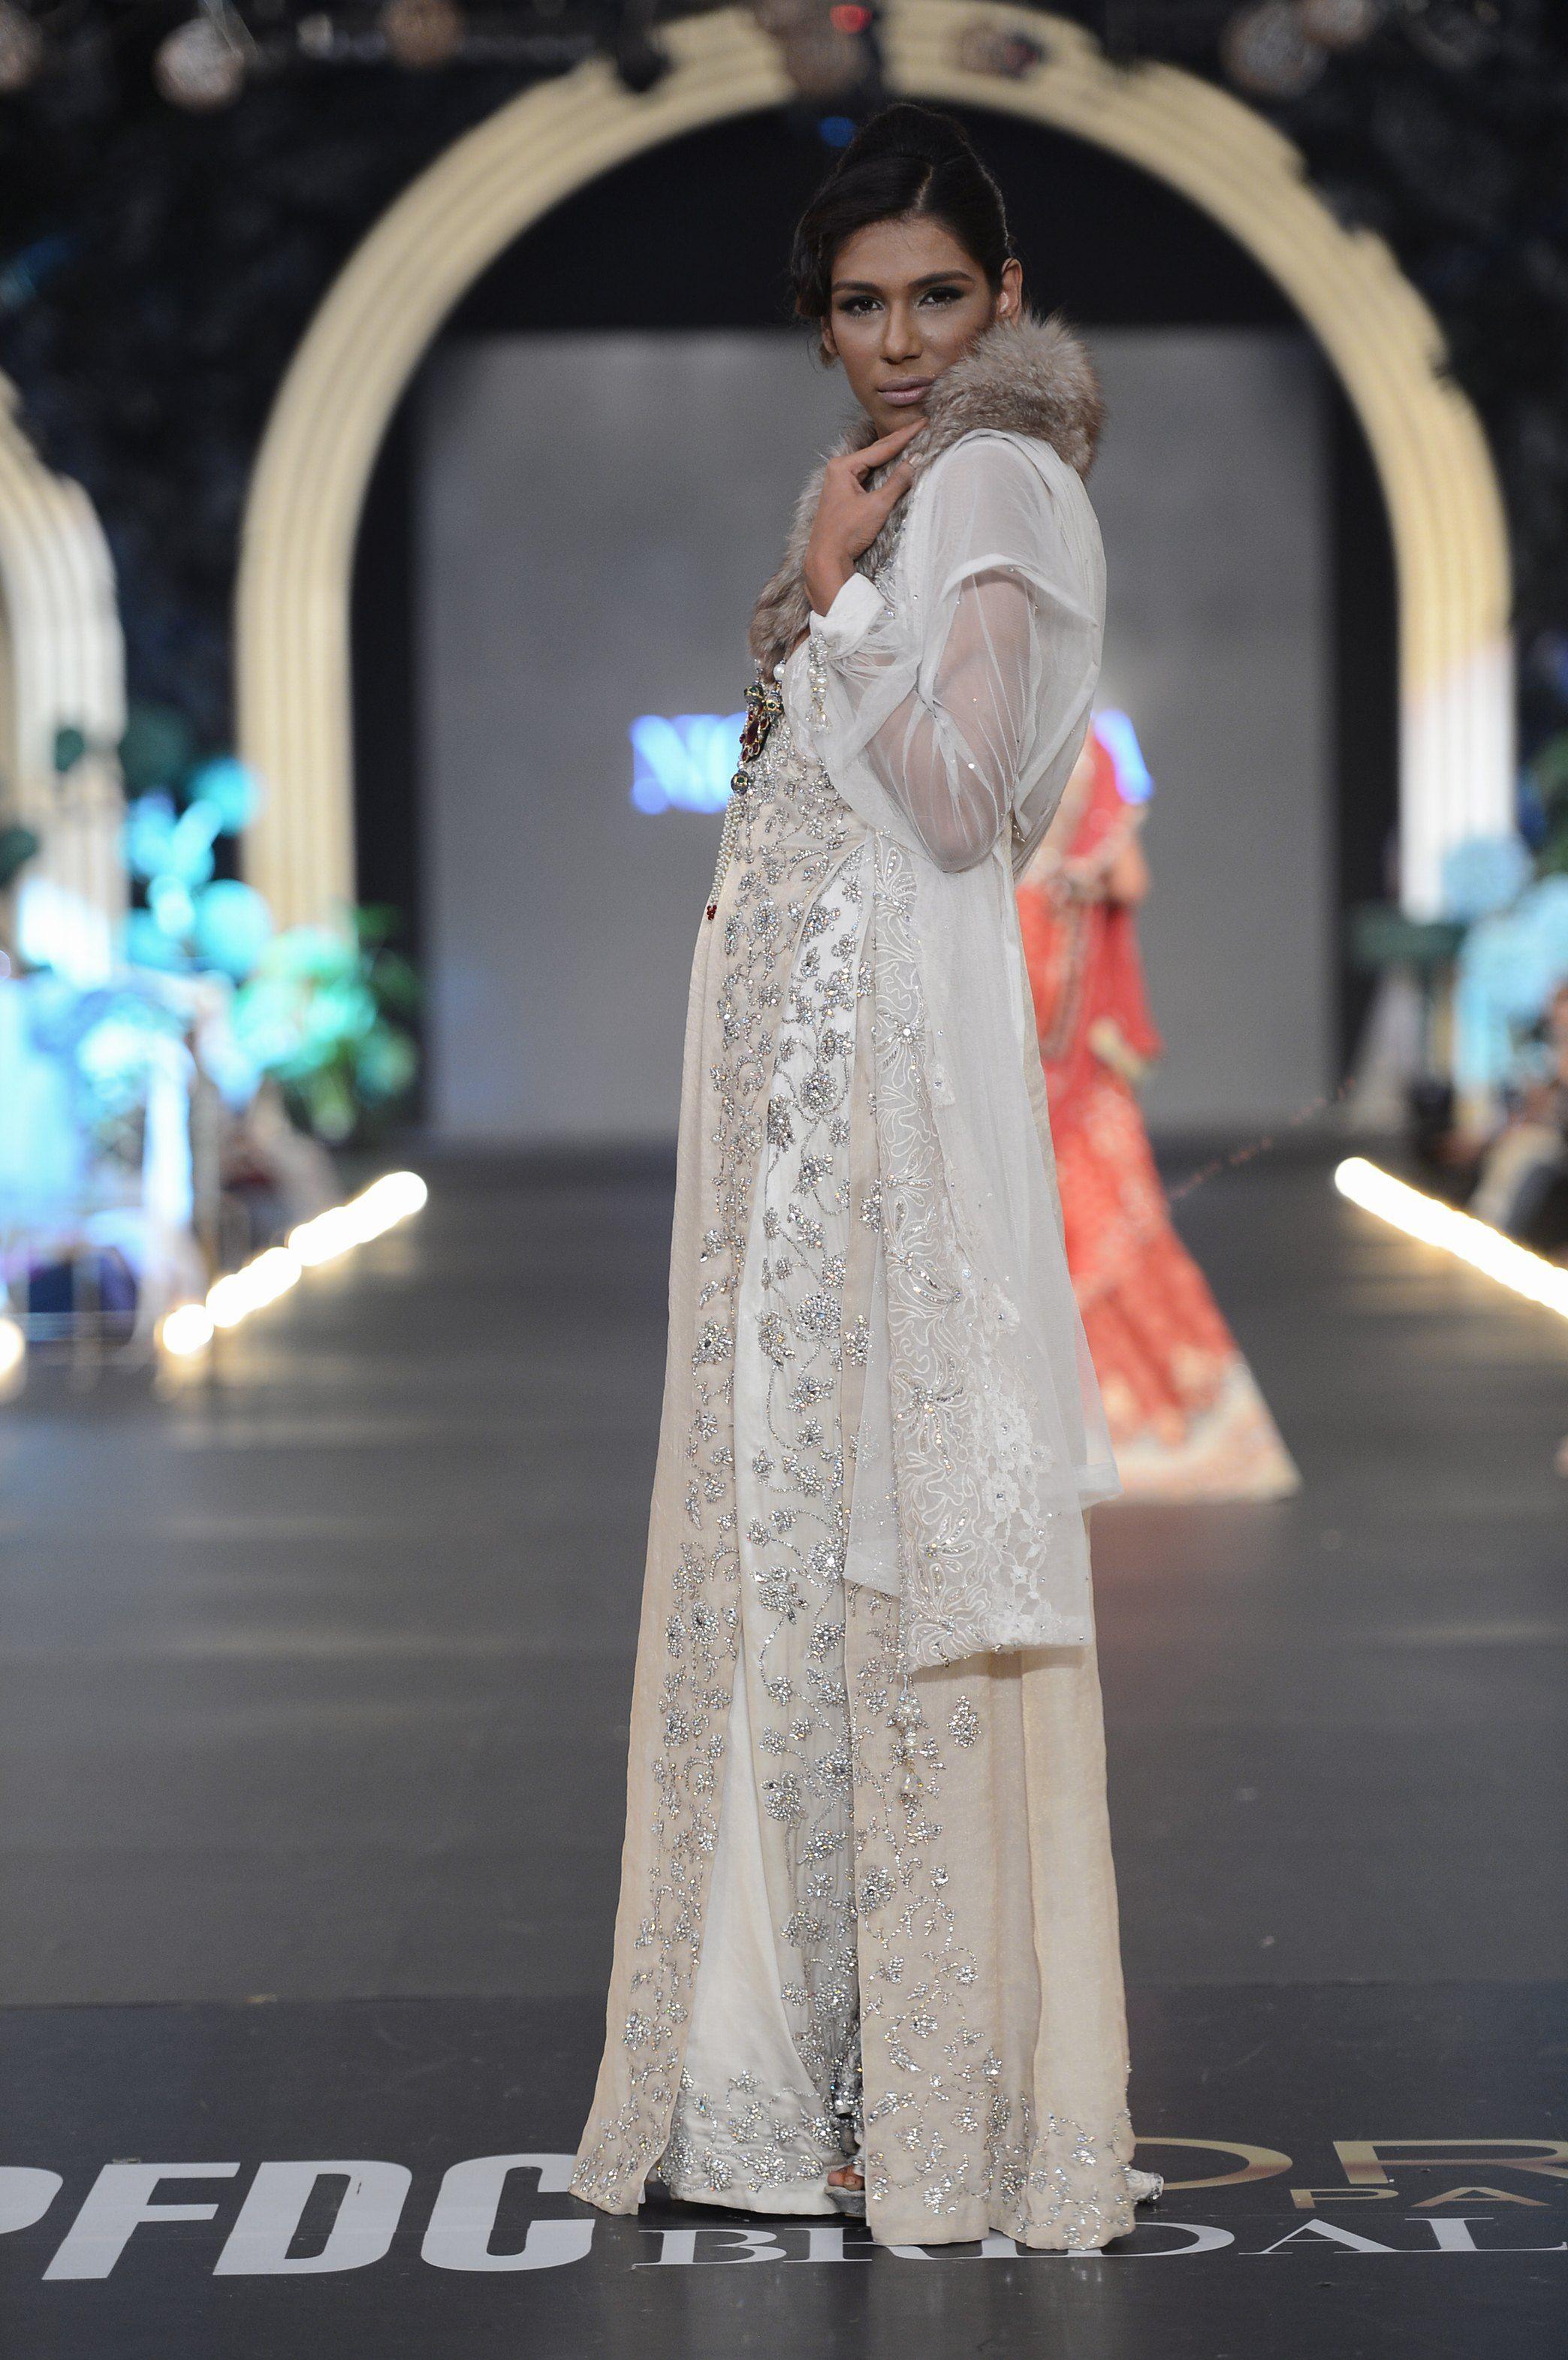 Nickienina Dresses Dress Partydresses Http Www Fashioncentral Pk Pakistani Designer Bridal Fashion Week 2015 Bridal Fashion Week Pakistani Formal Dresses